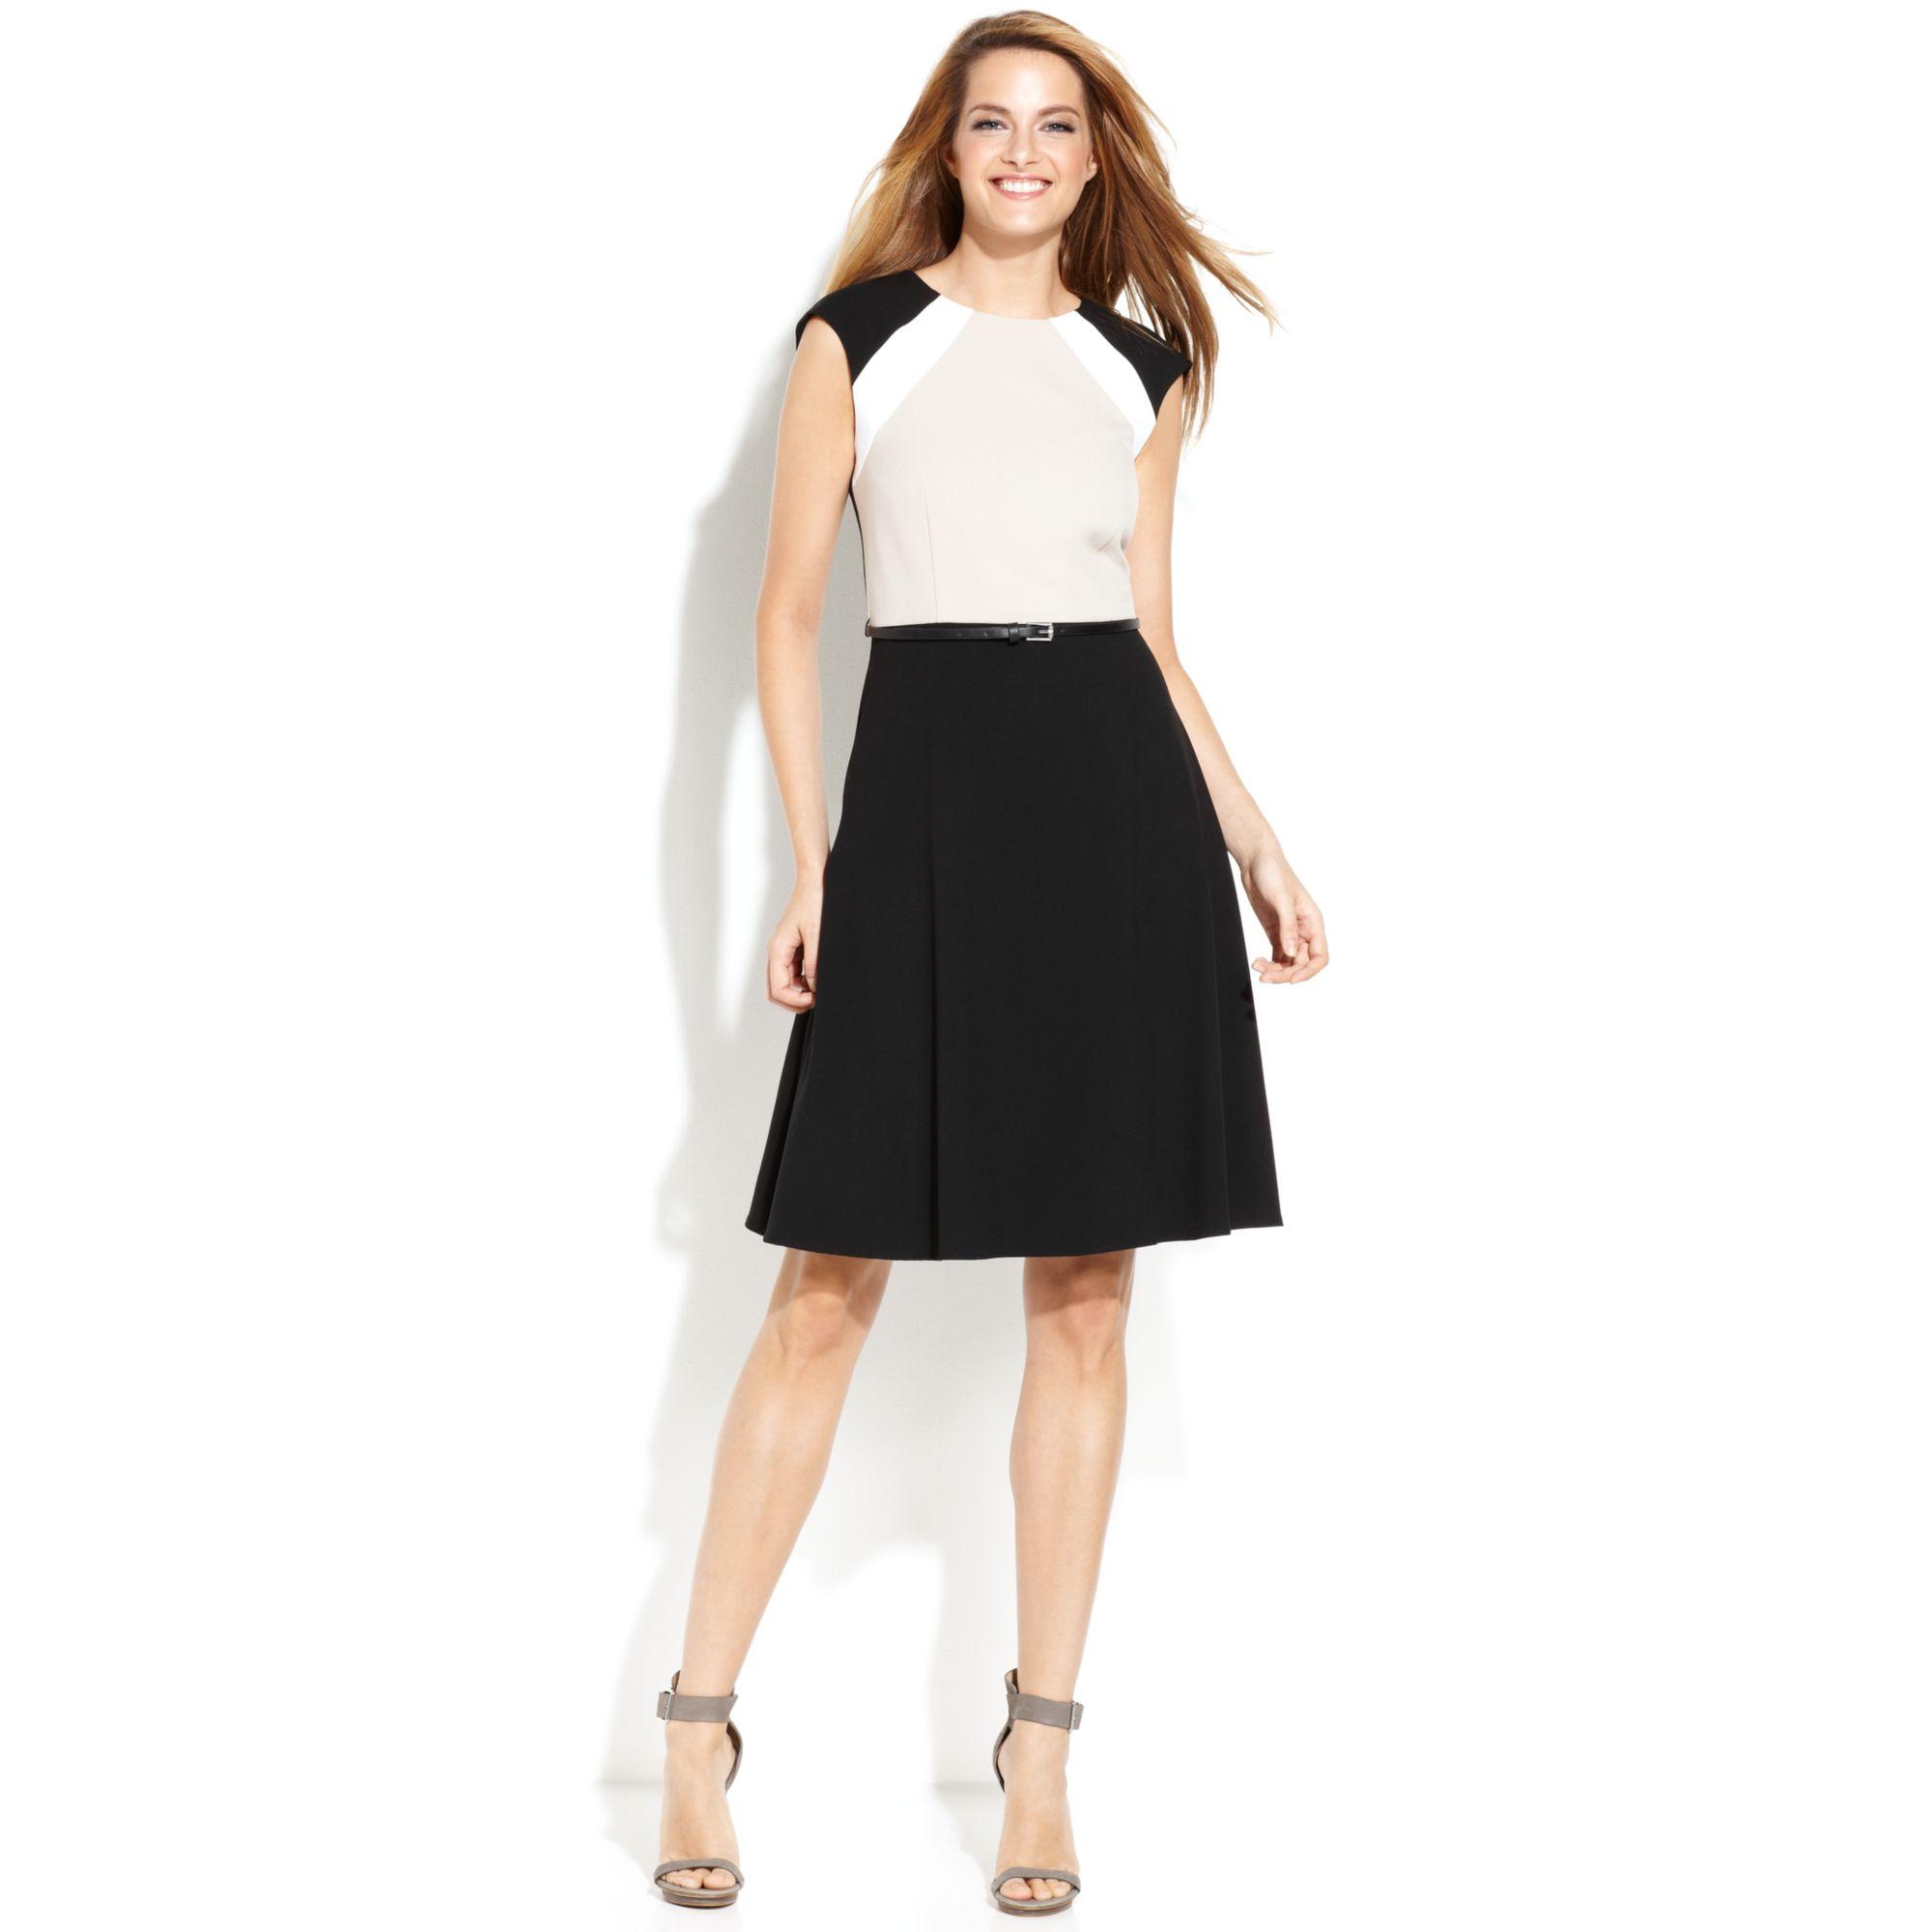 Calvin Klein Sleeveless Belted Colorblock Dress In Black